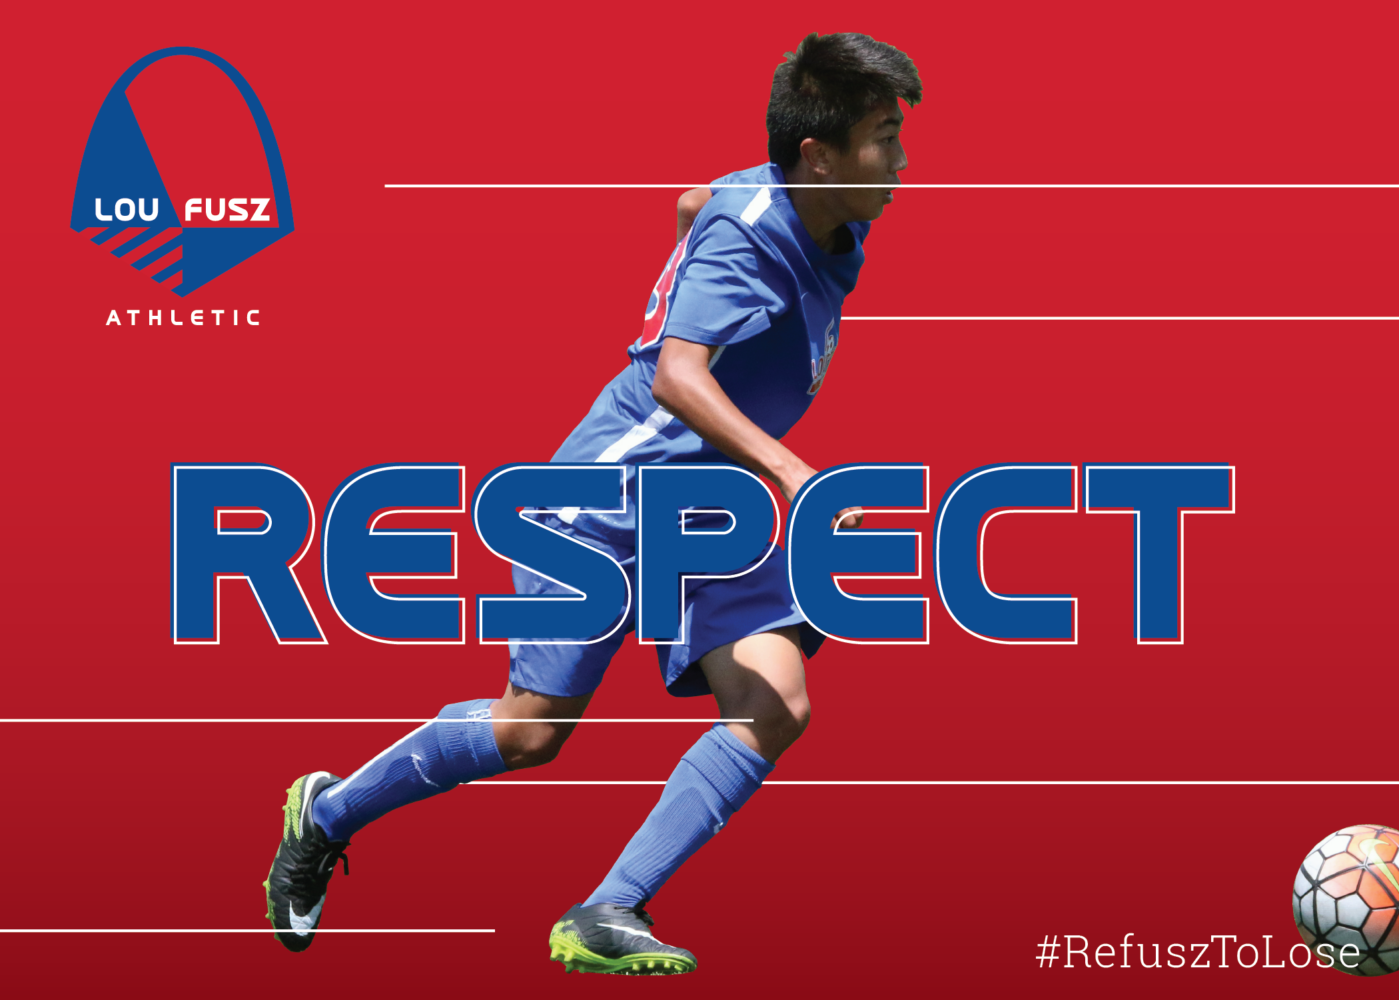 Respect - LFA Philosophy